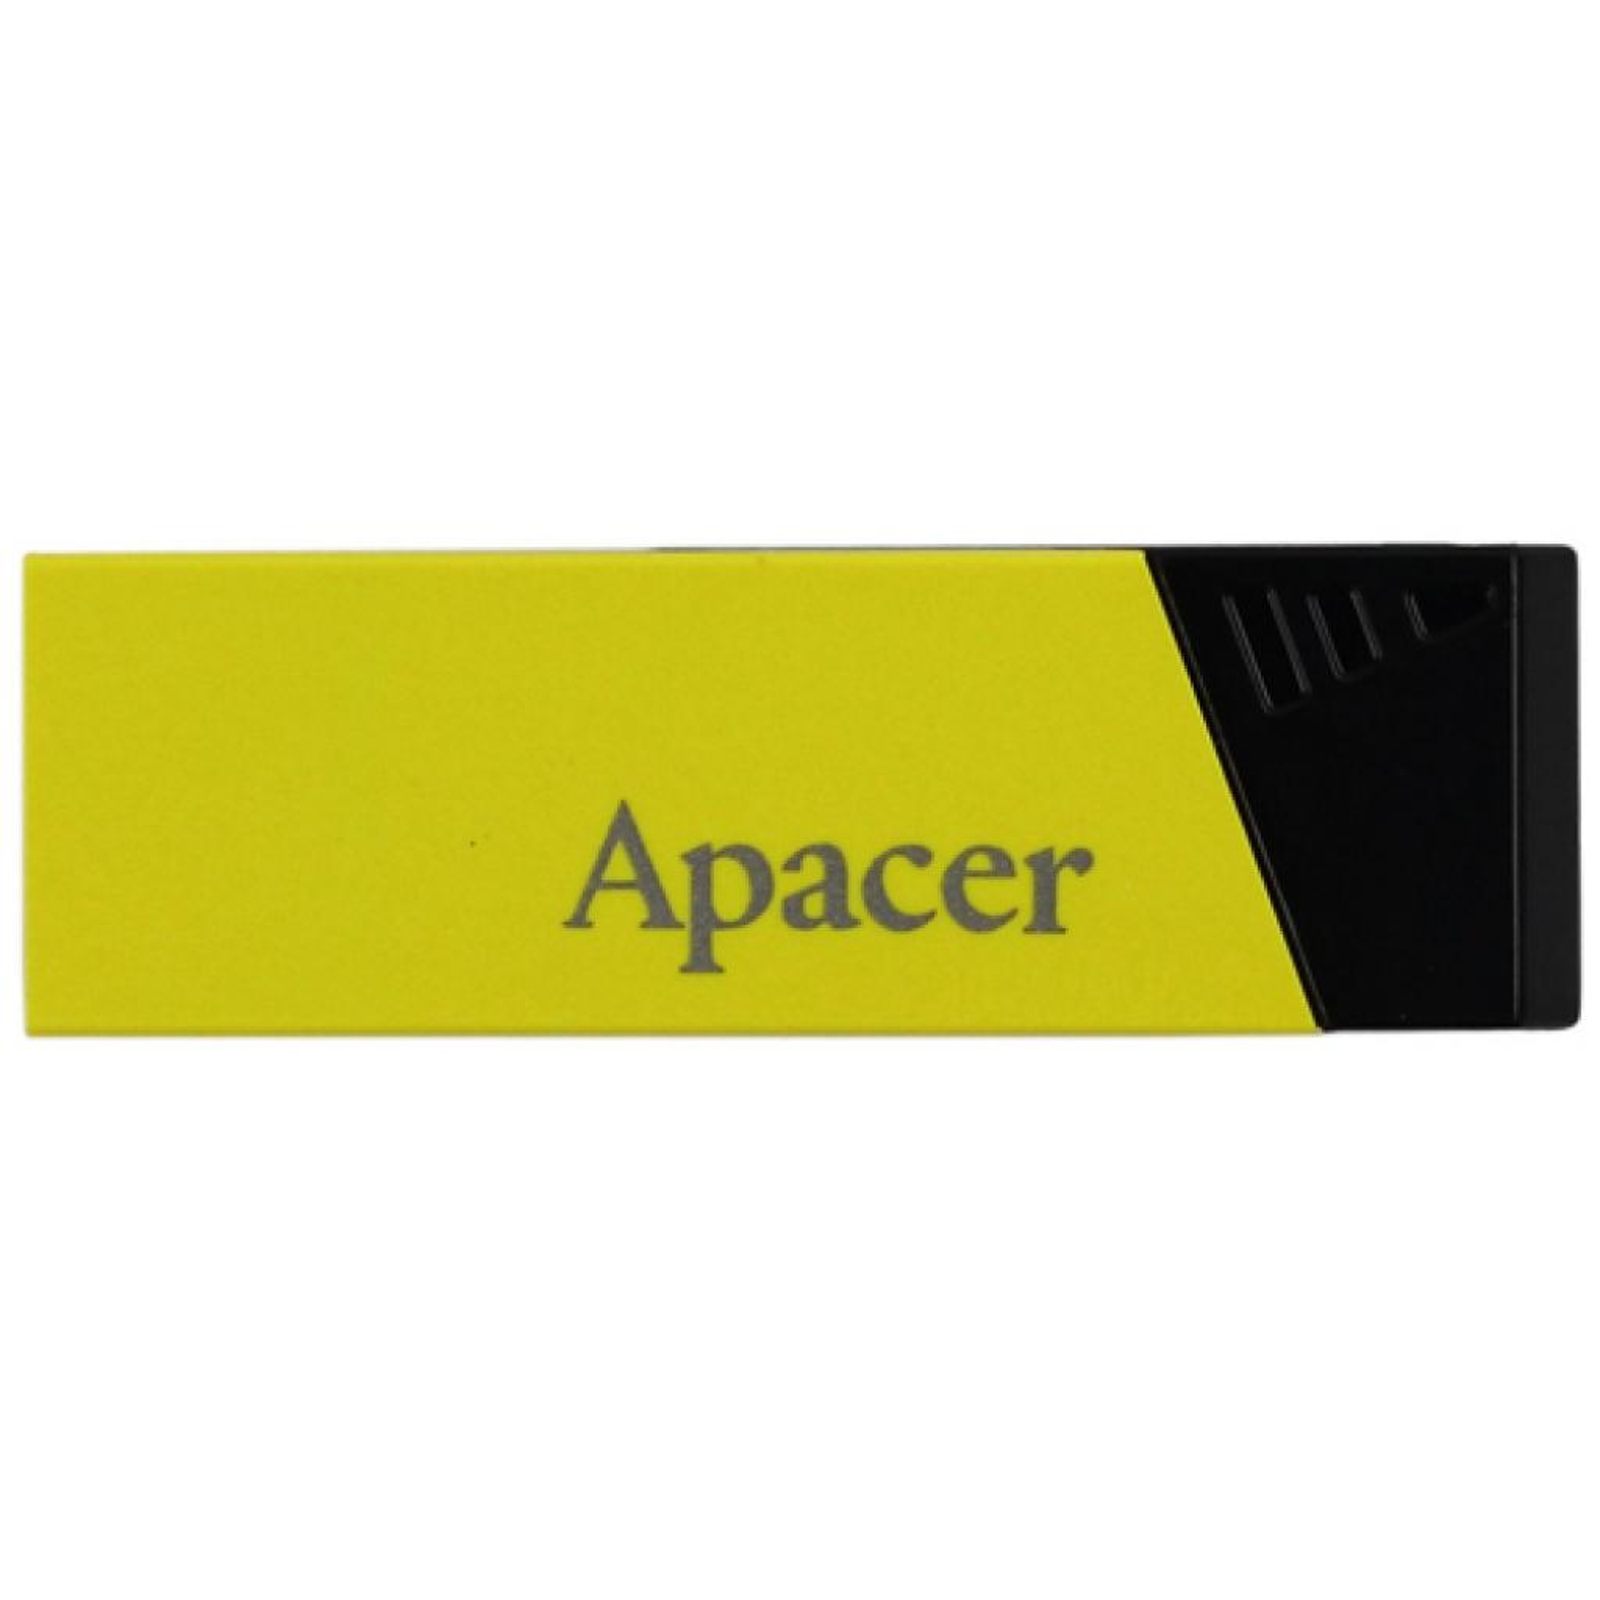 USB флеш накопитель 8GB AH131 Yellow RP USB2.0 Apacer (AP8GAH131Y-1)